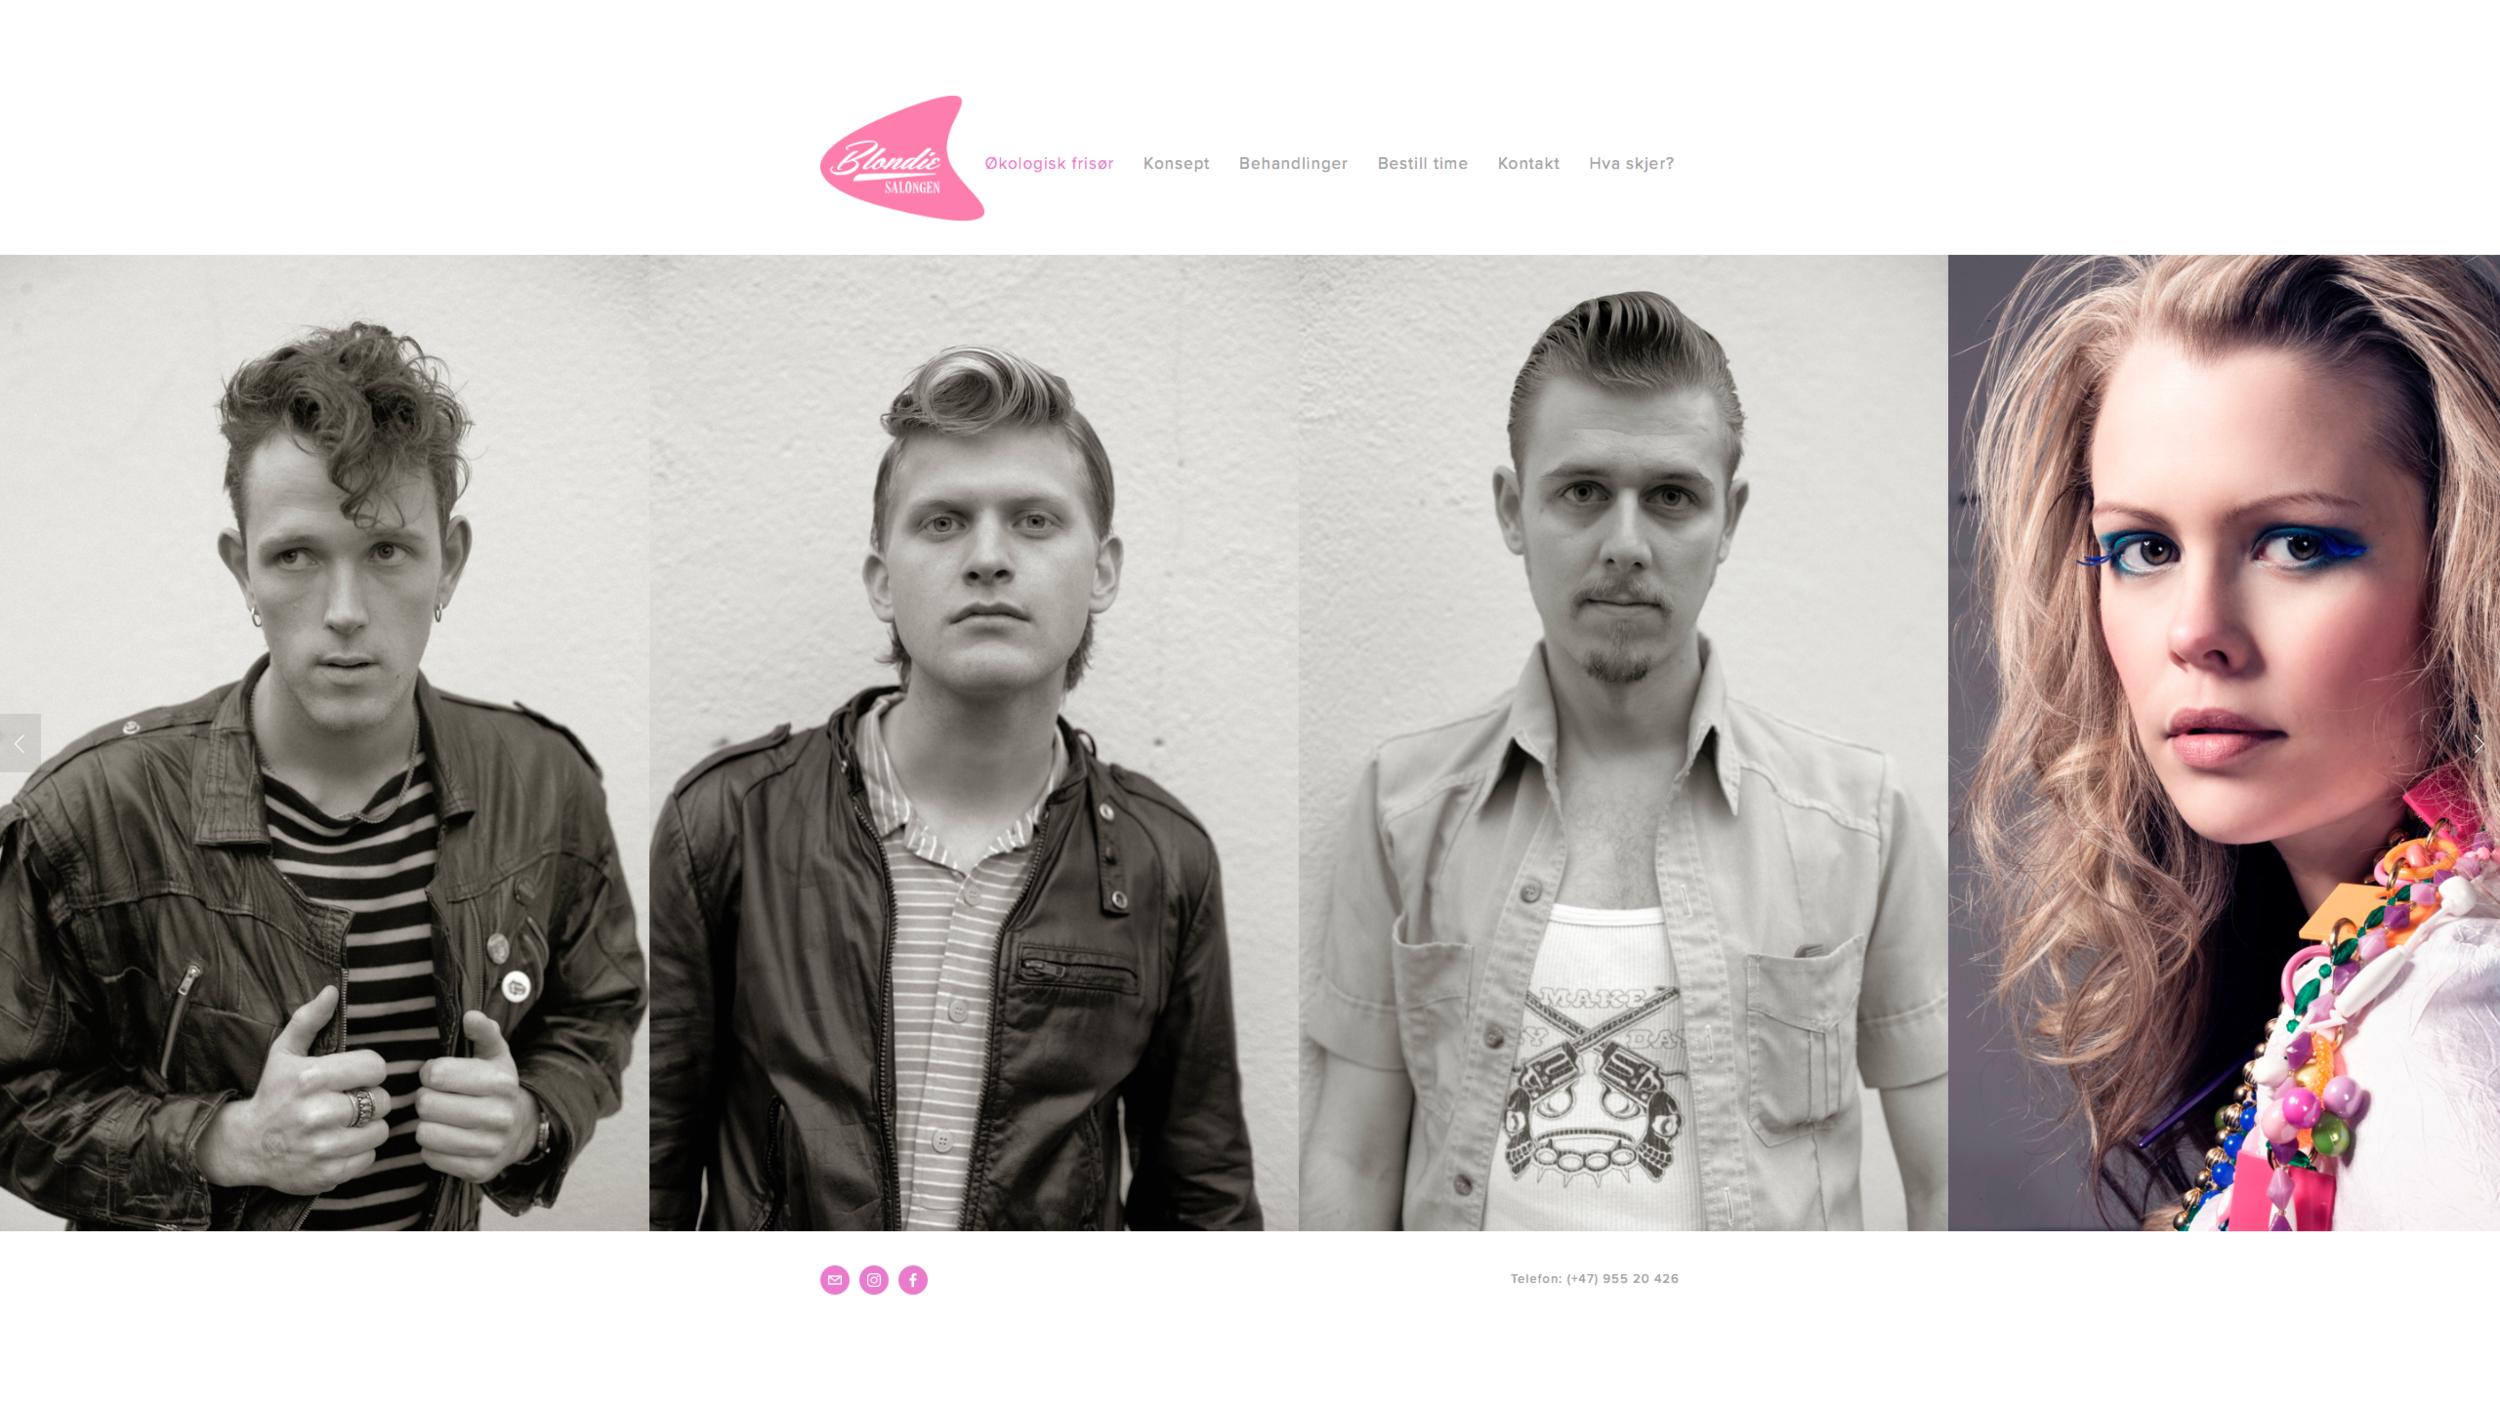 Web design for Blondie Salongen, hair salon